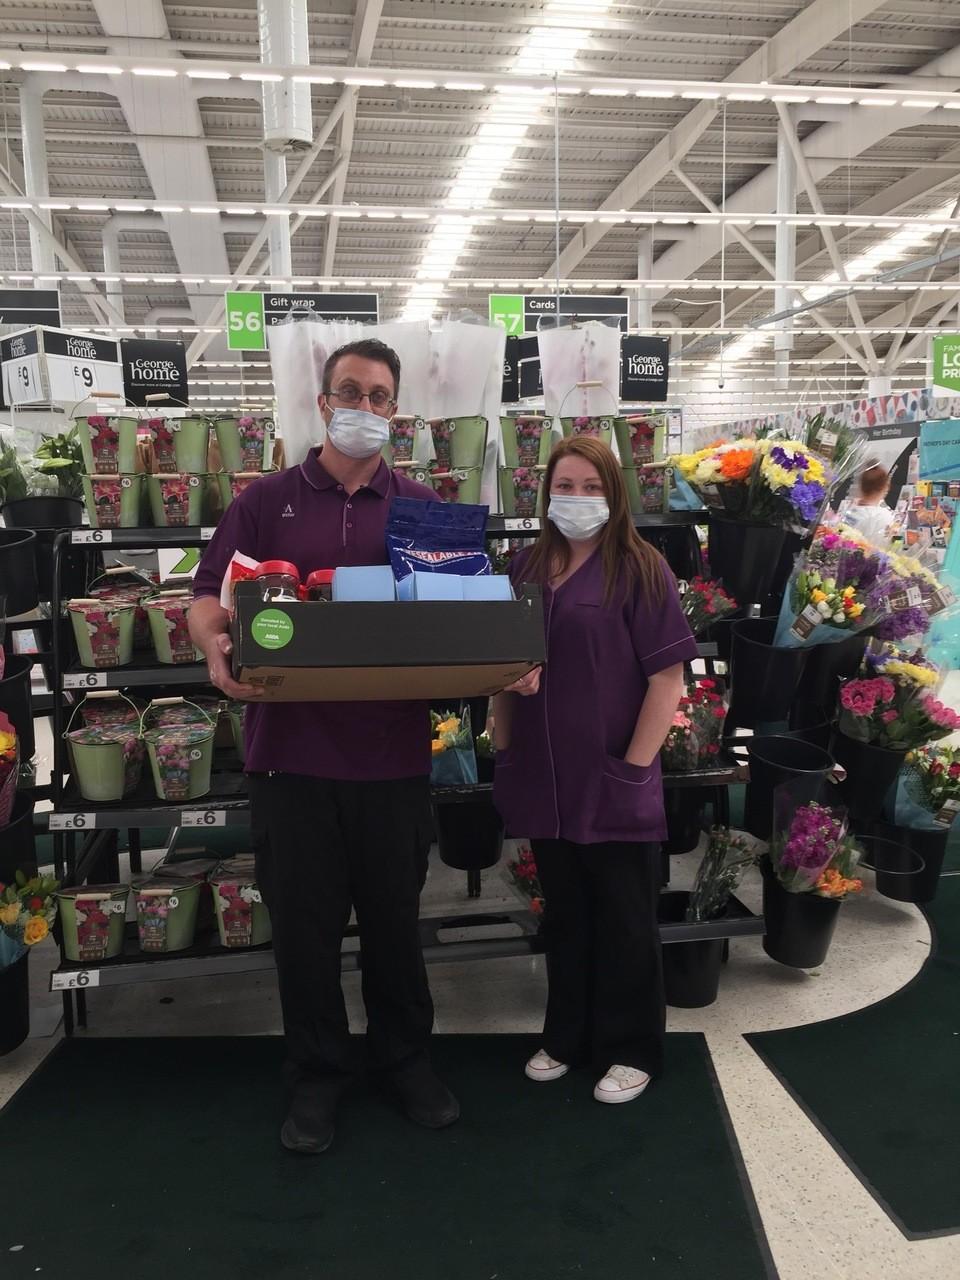 Care home donation | Asda Wigan